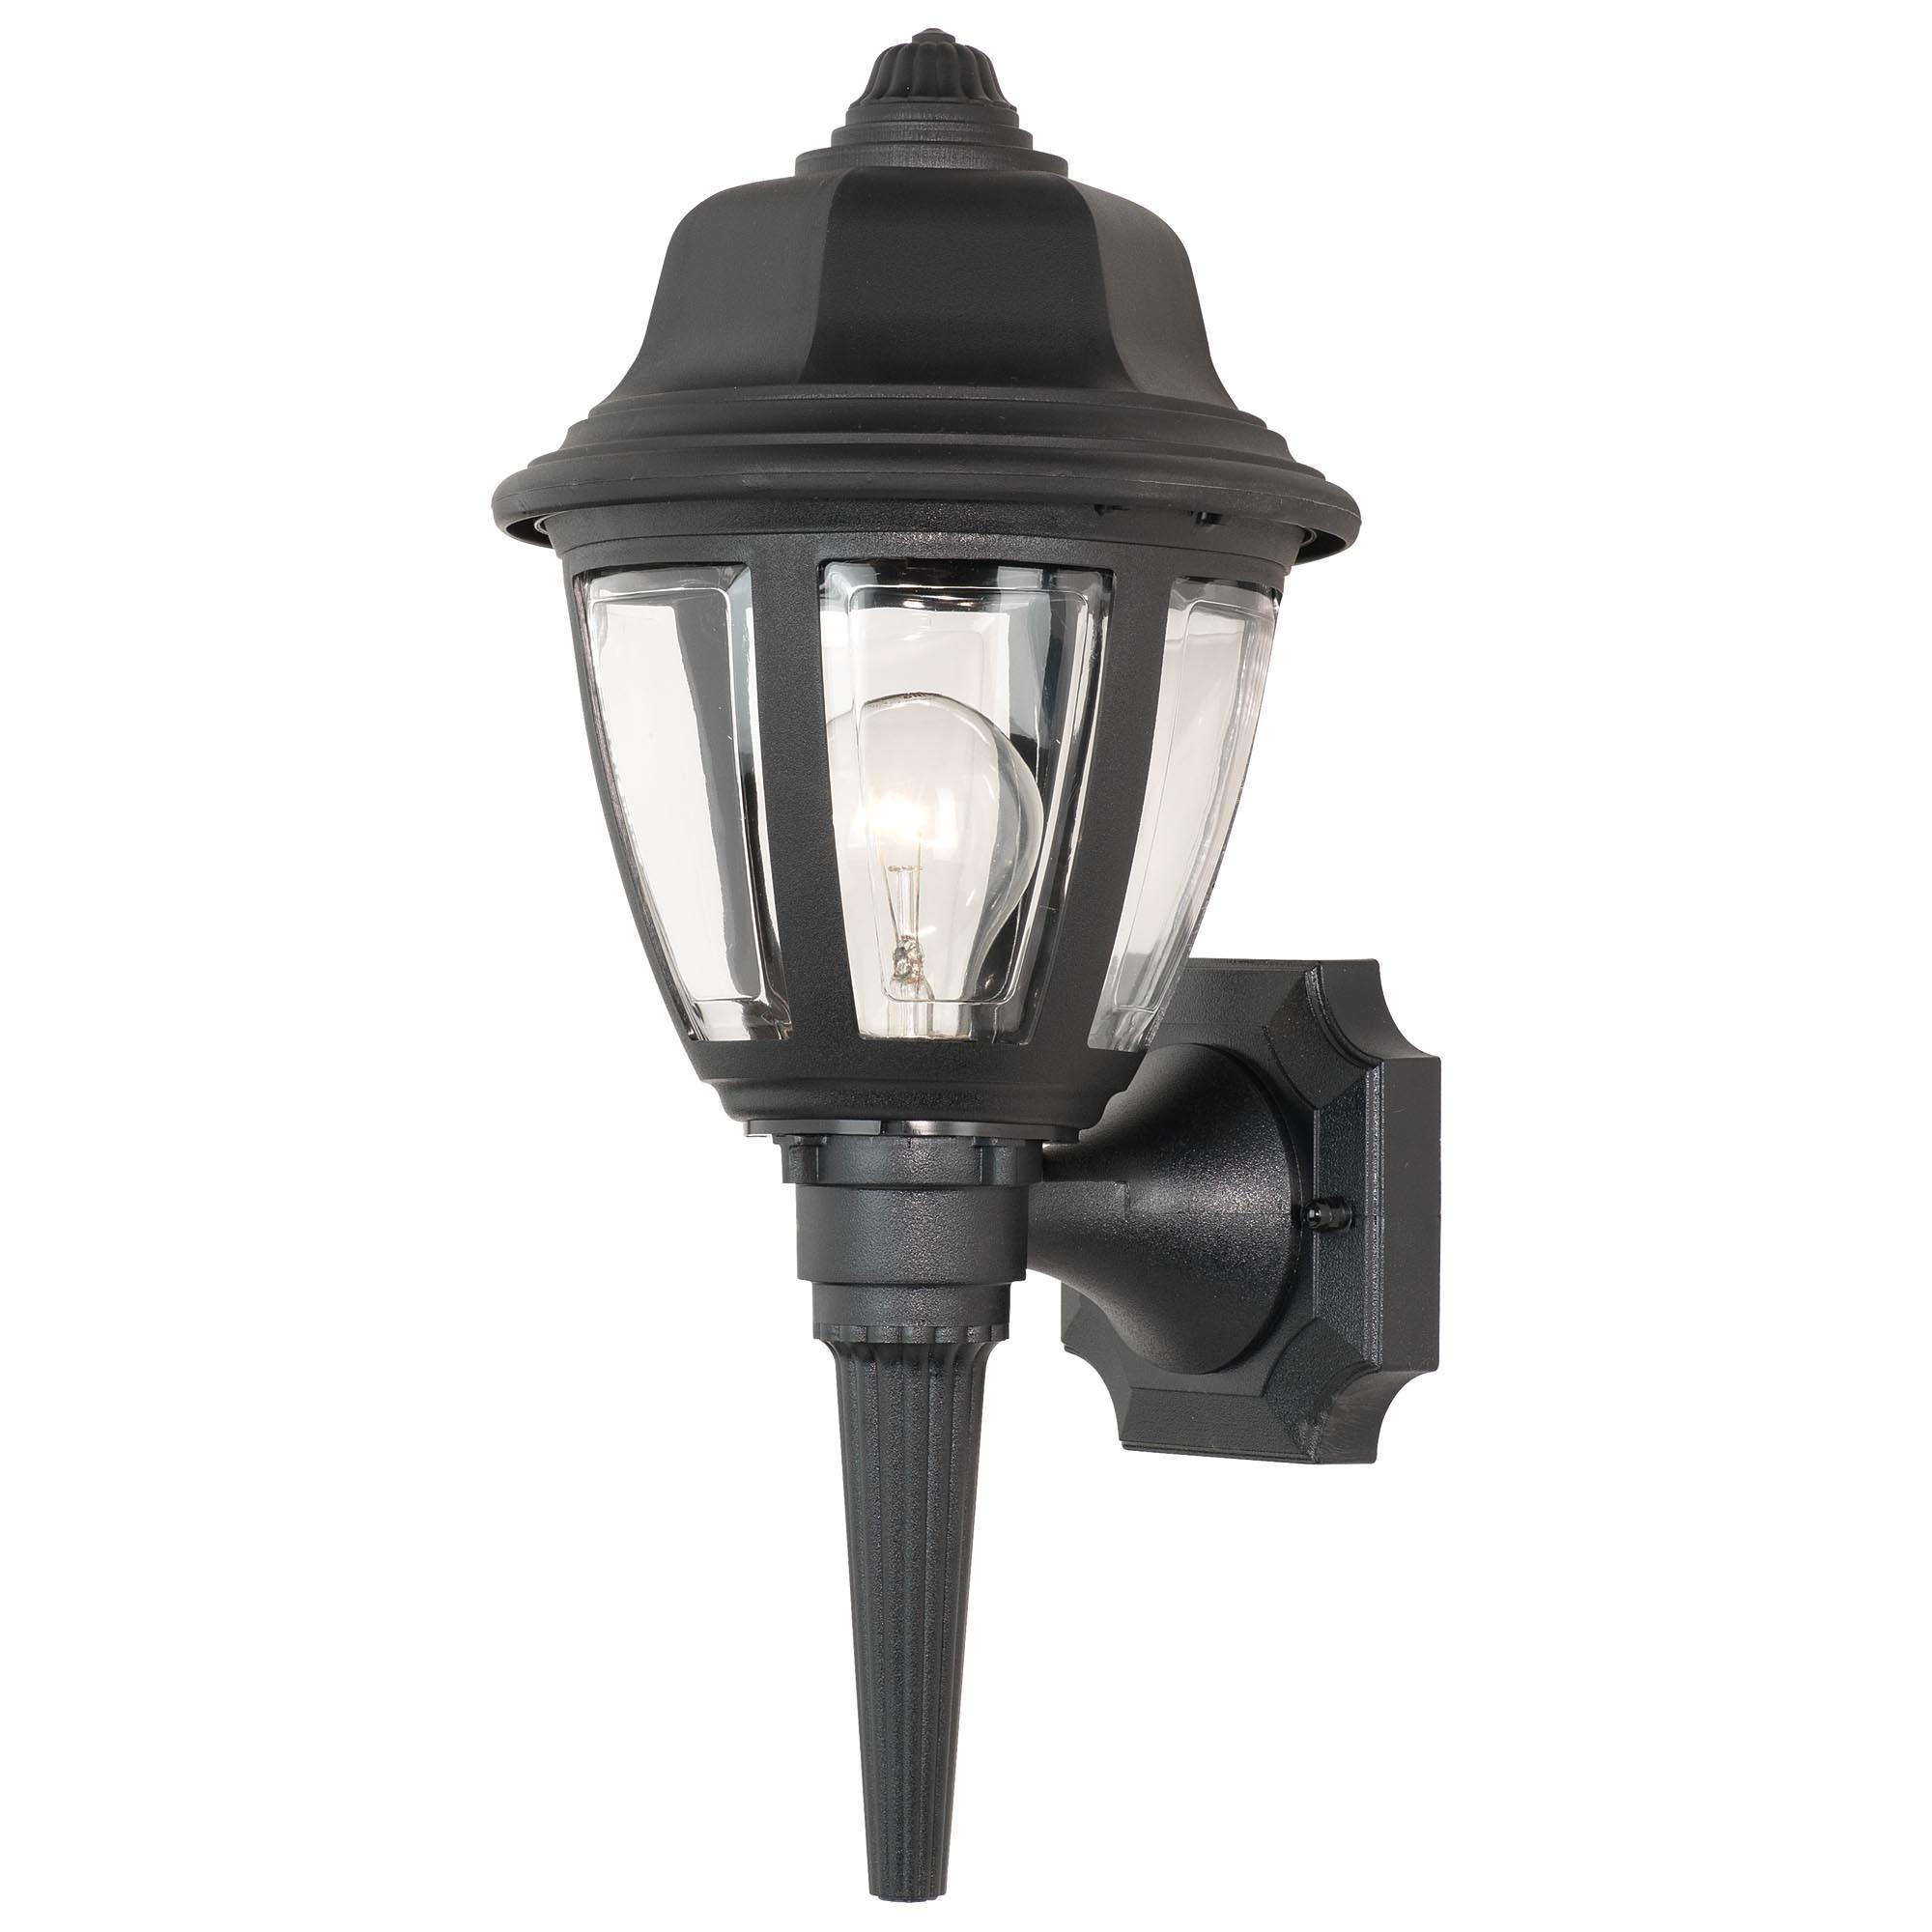 Modern Rustic Outdoor Lighting Att Wayfair Throughout Most Recently Released Sconces Wayfair 1 Light Wall Lamp ~ Clipgoo (View 11 of 20)